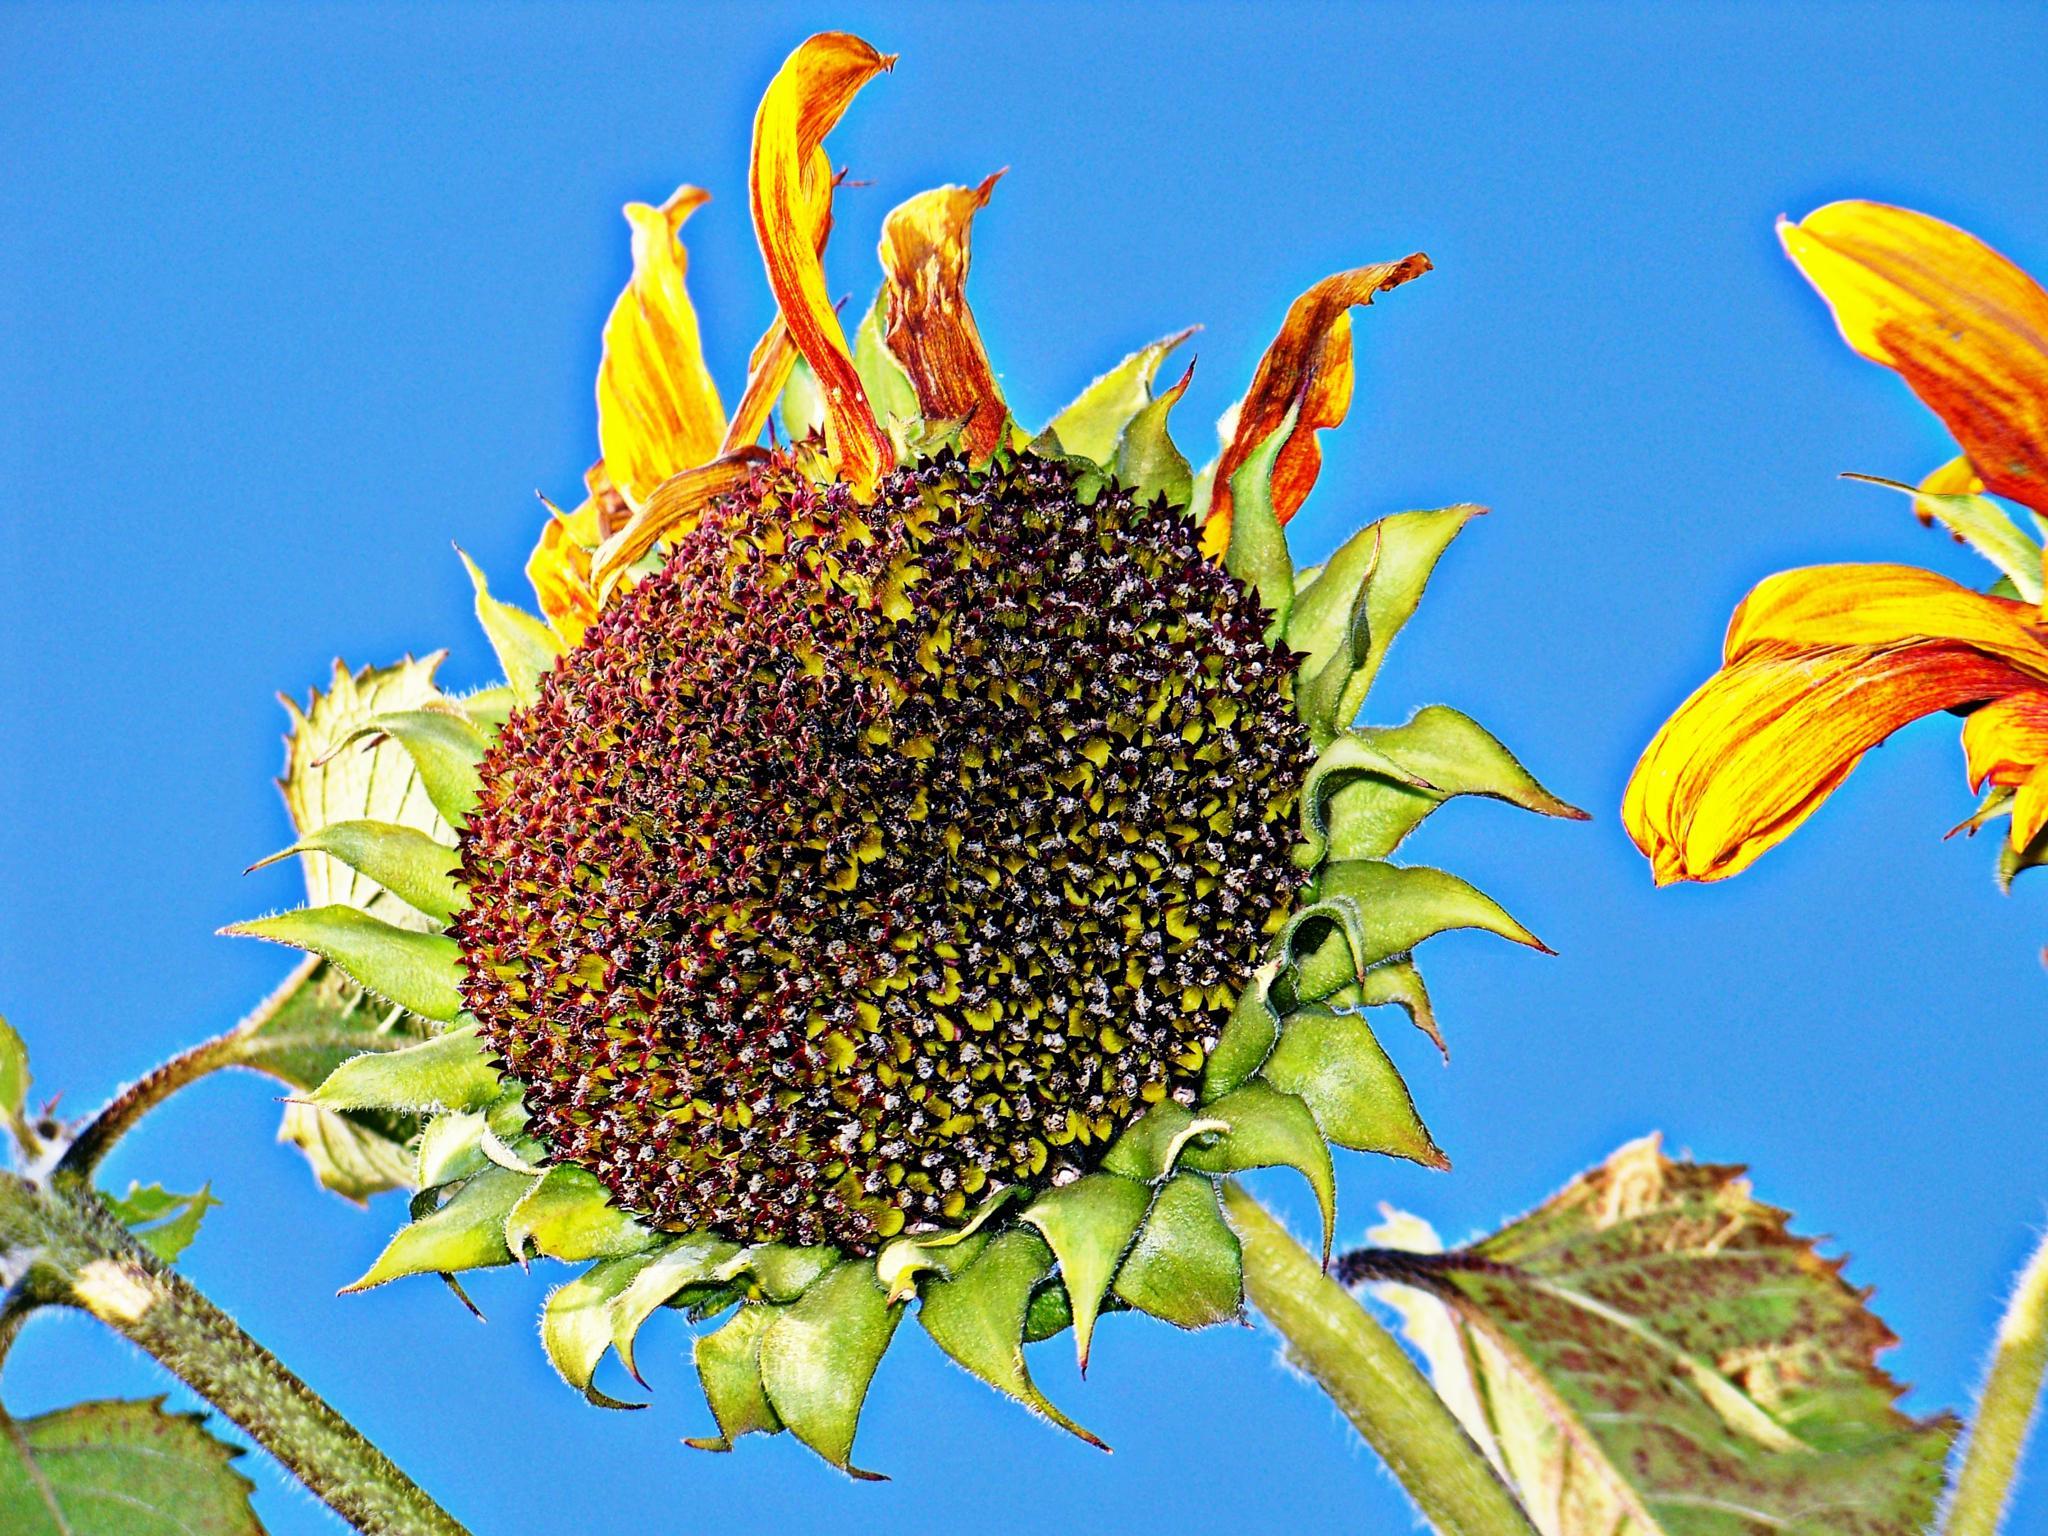 Looking Seedy by jone suleski